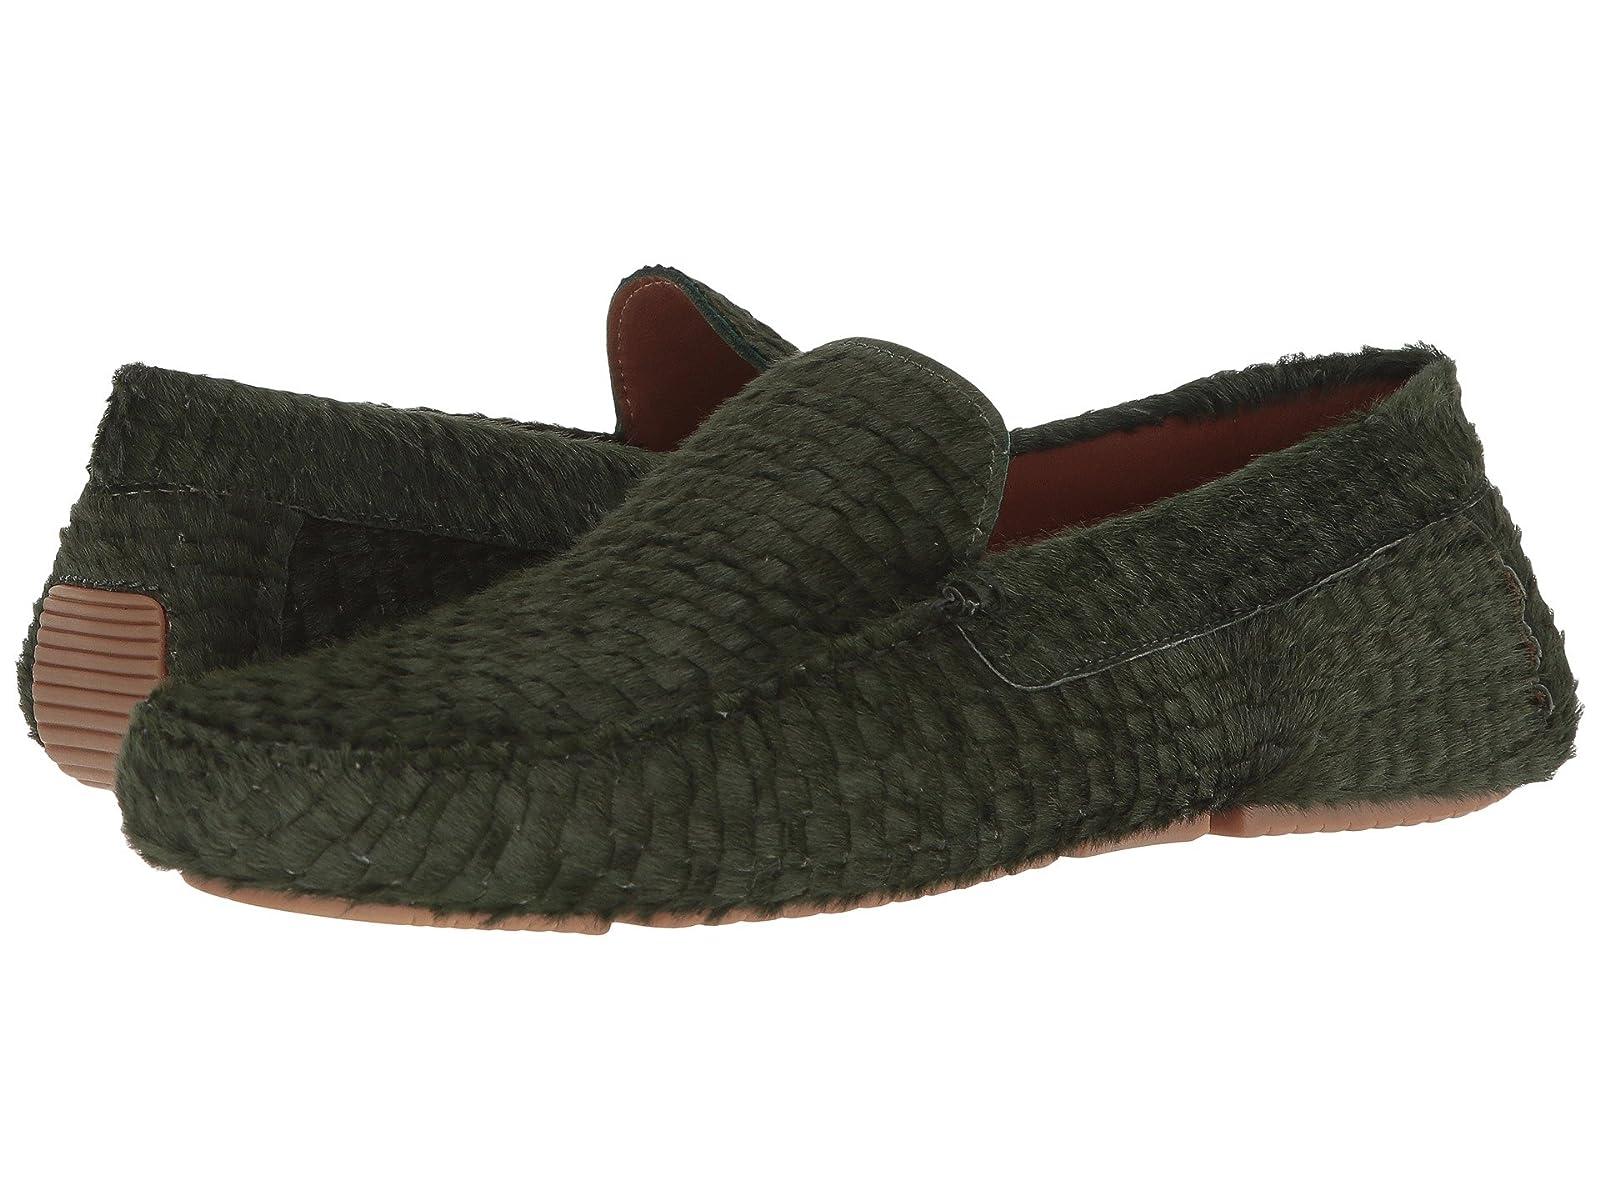 Aquatalia BryceCheap and distinctive eye-catching shoes